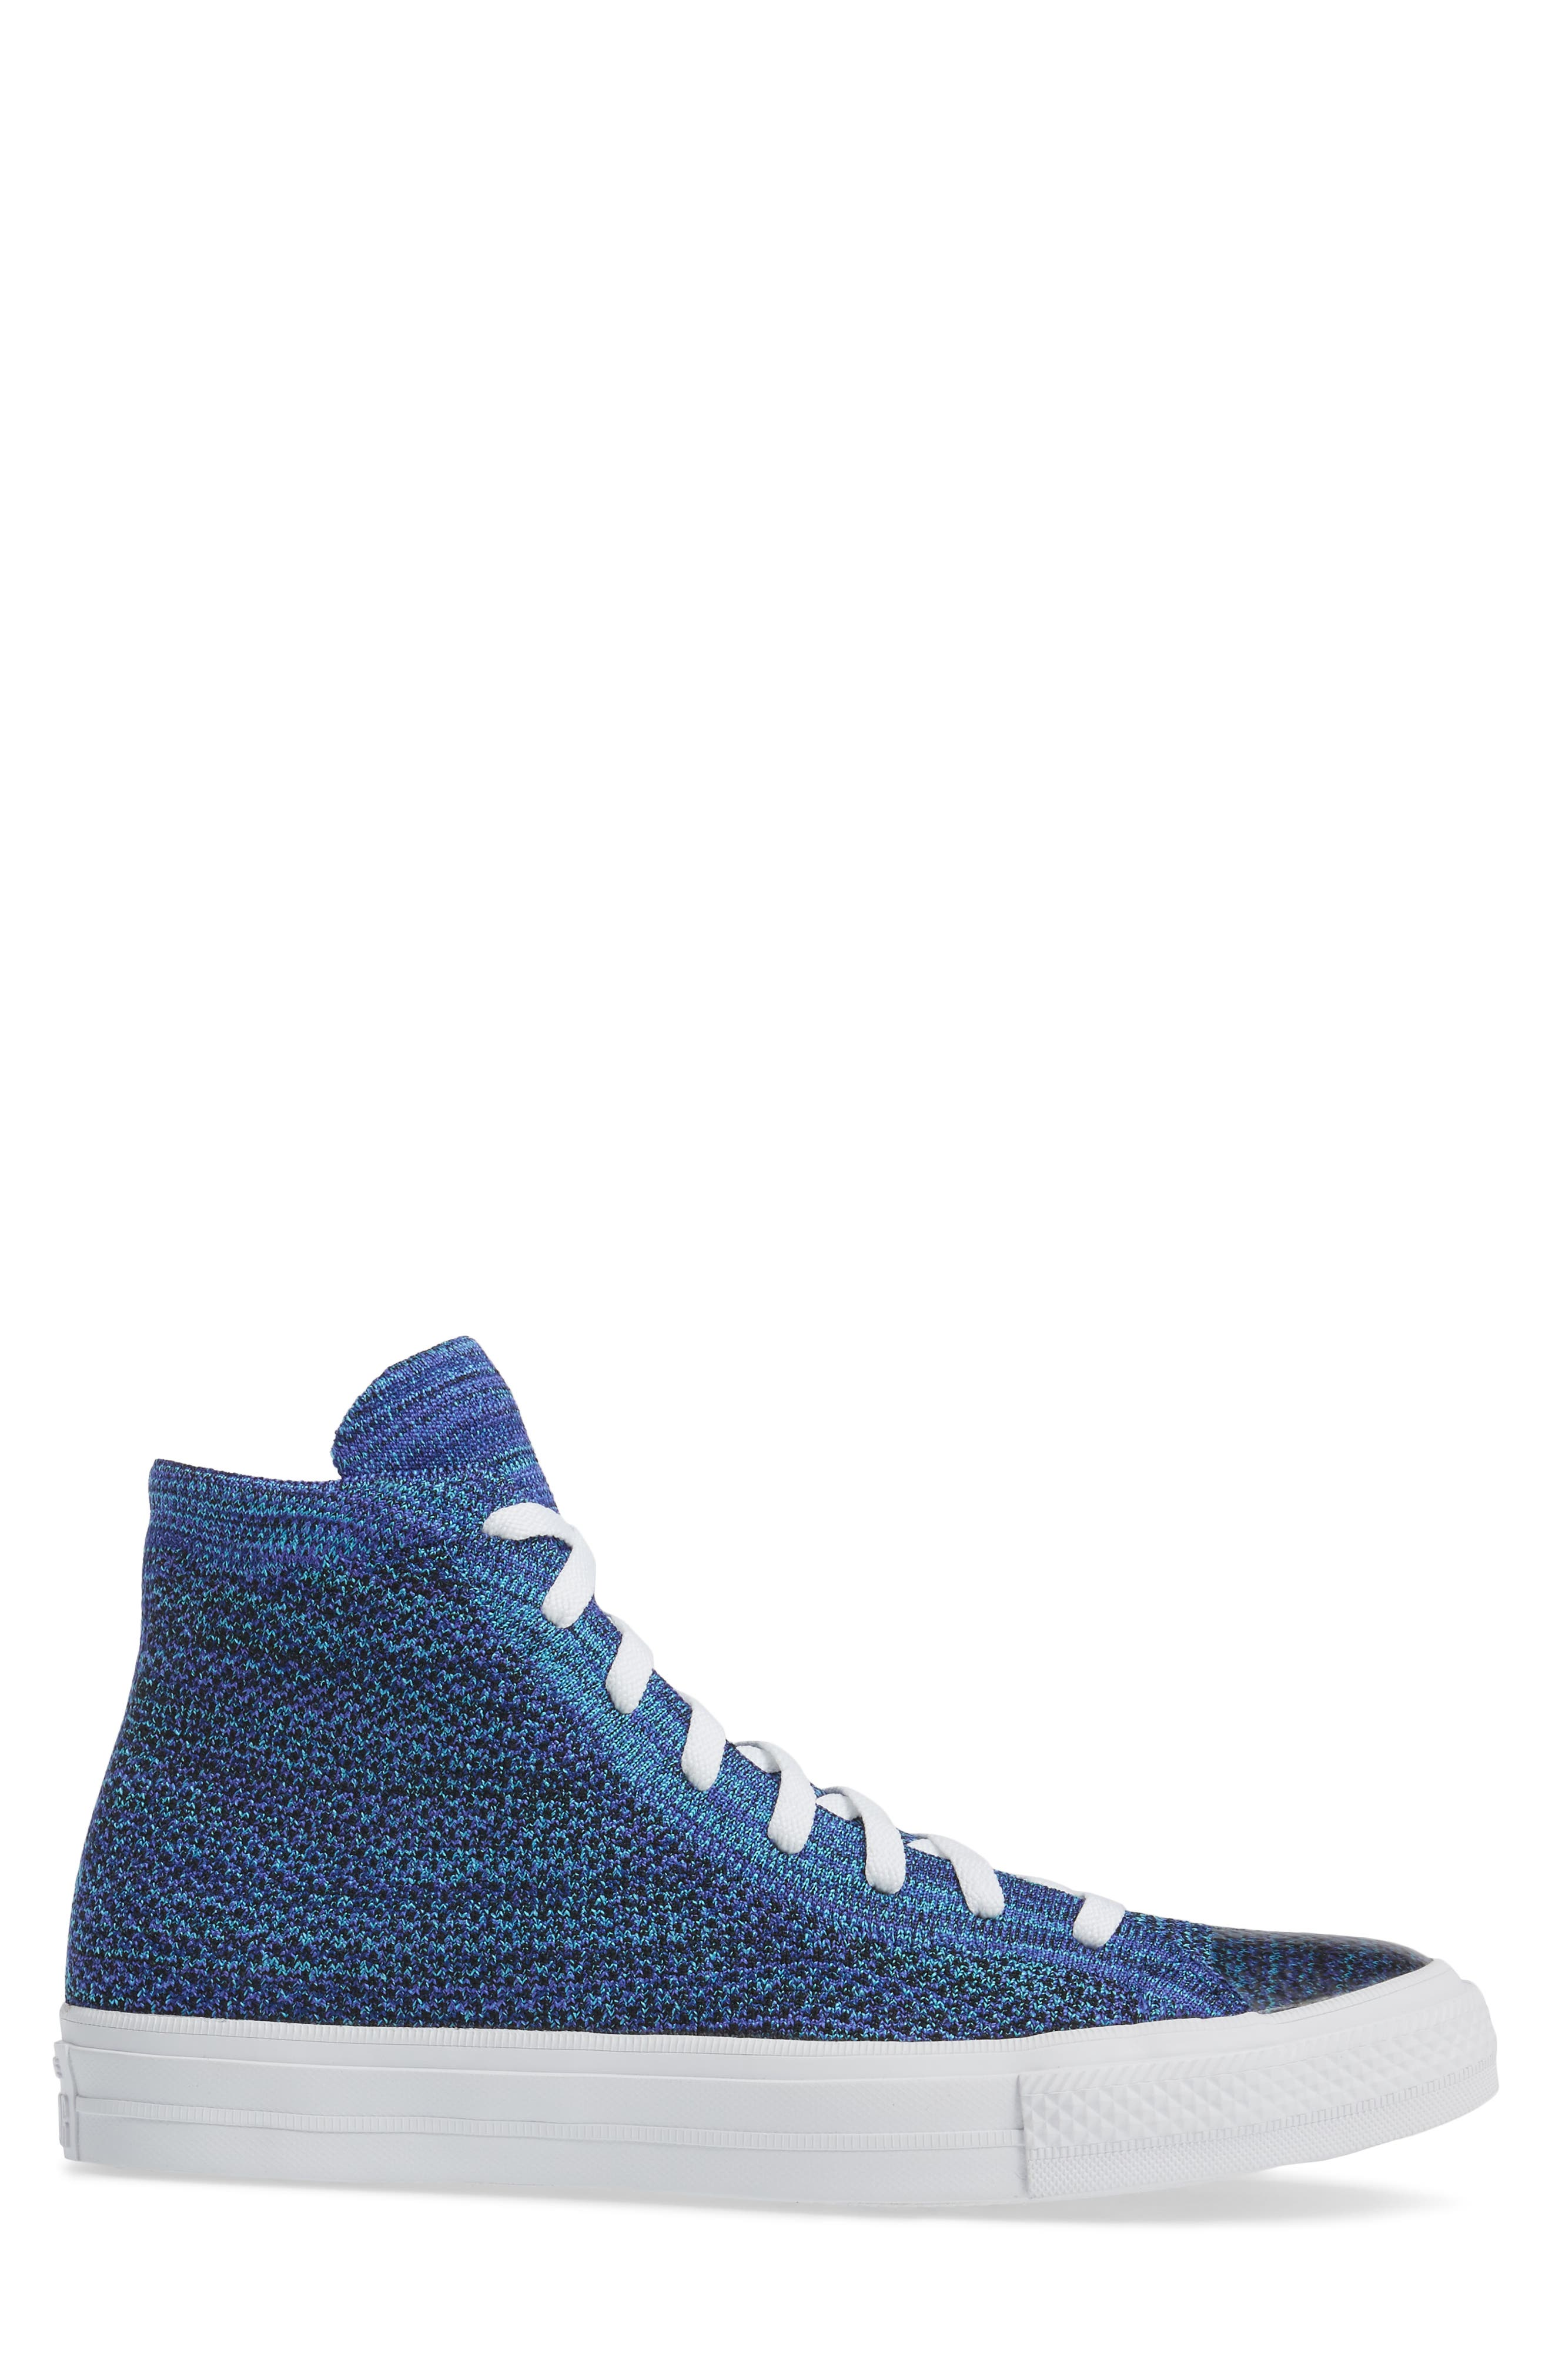 Chuck Taylor<sup>®</sup> All Star<sup>®</sup> Flyknit Hi Sneaker,                             Alternate thumbnail 3, color,                             Indigo